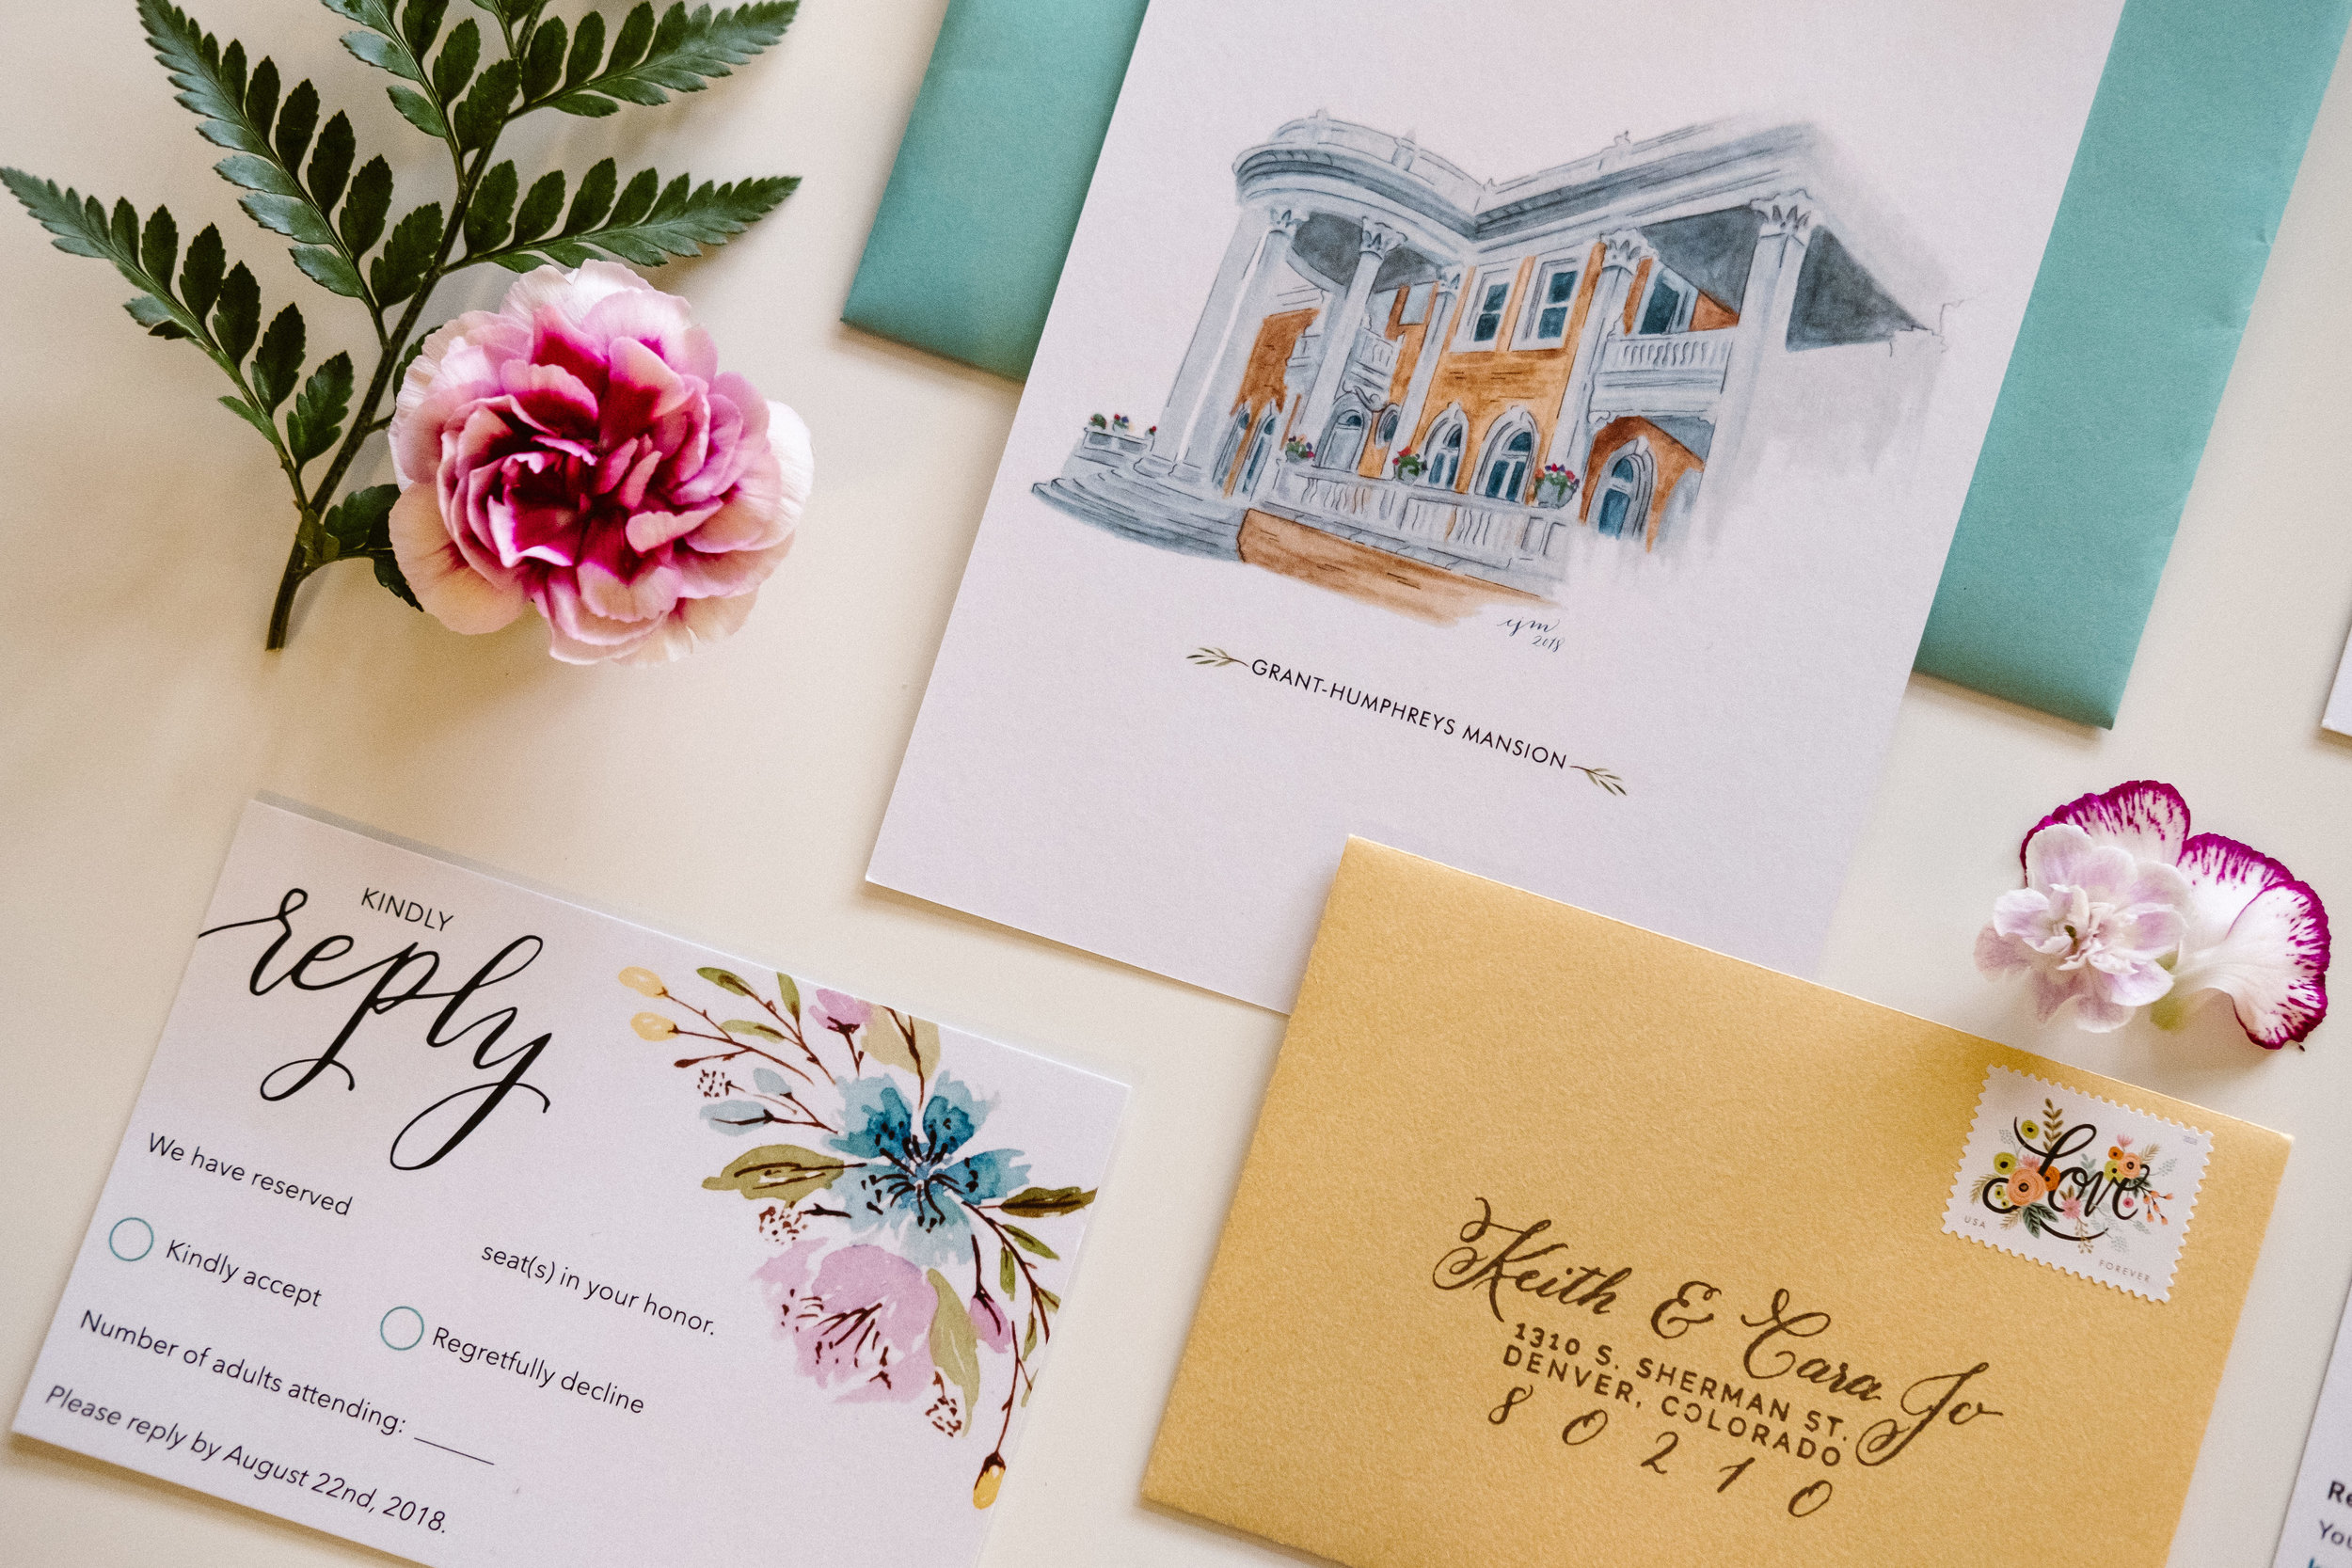 cara-jo-keith-grant-humphreys-mansion-wedding-7-82.jpg